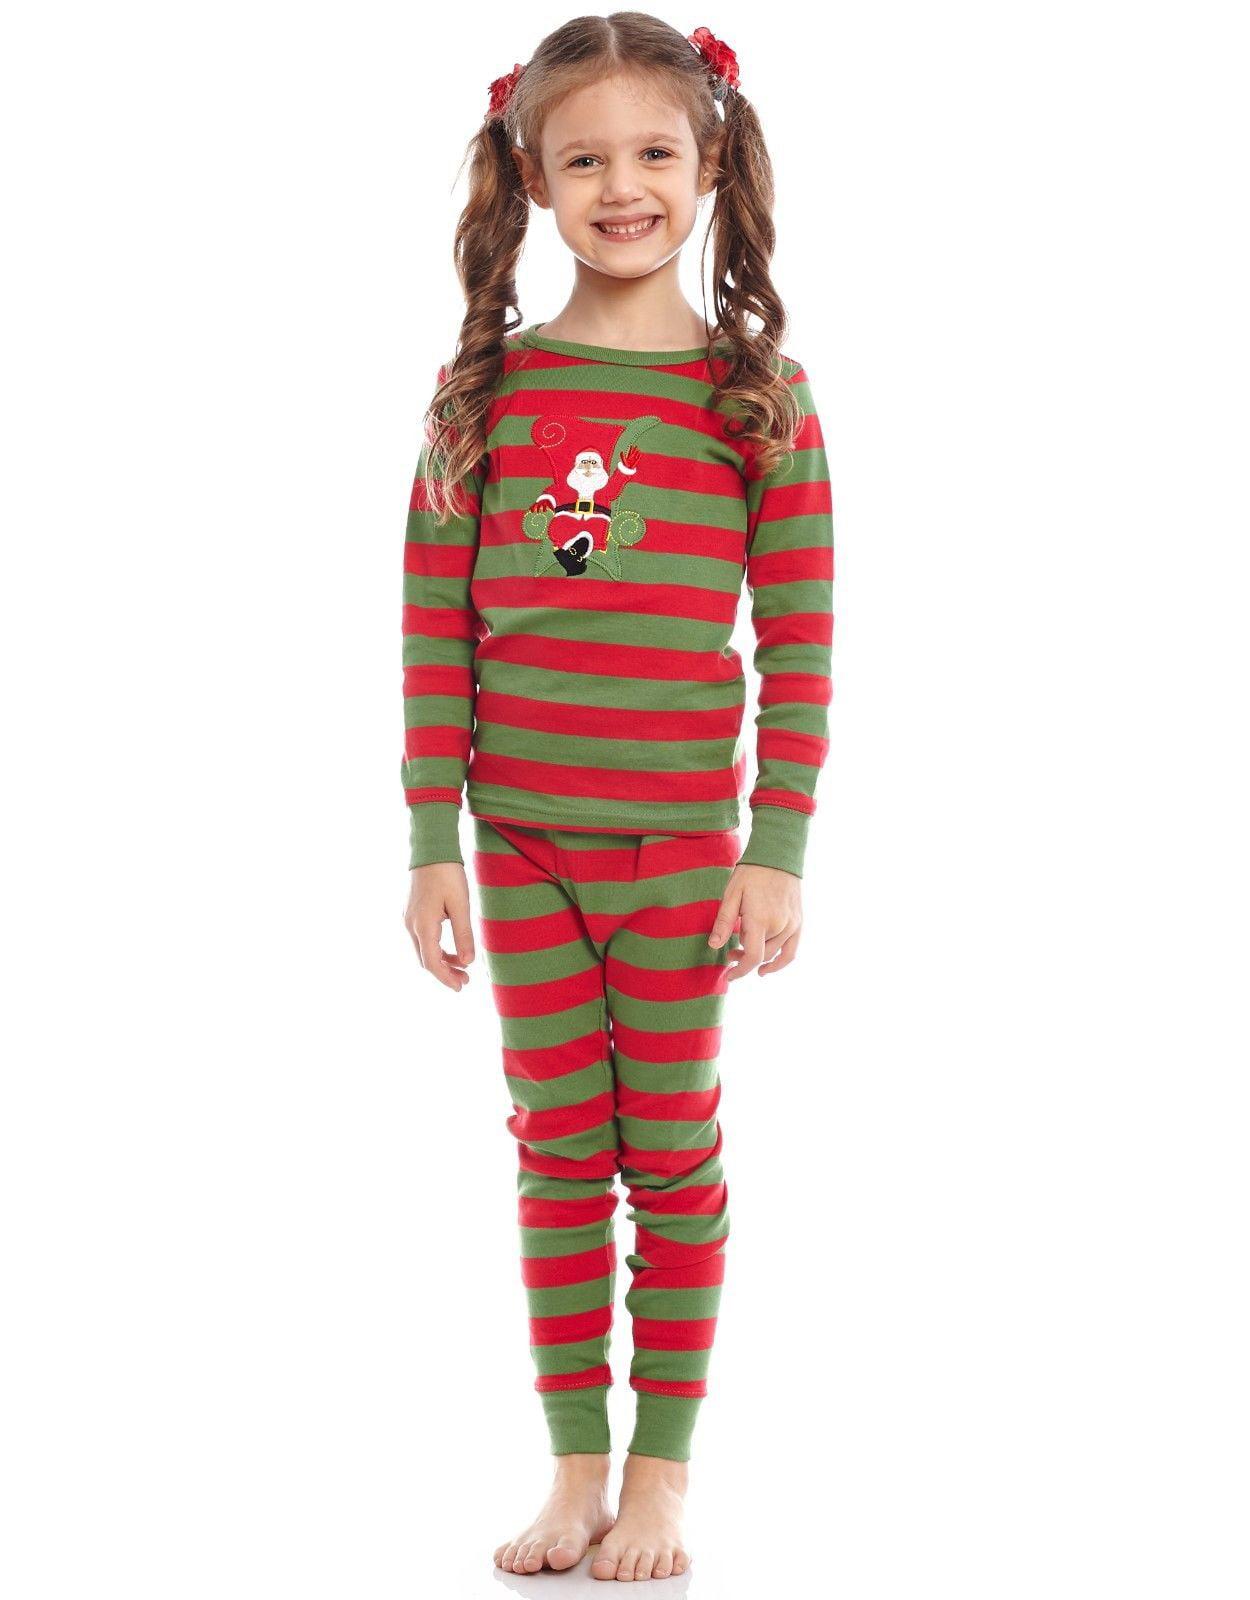 Leveret Kids Christmas Pajamas Boys Girls /& Toddler Pajamas Red White Green 2 Piece Pjs Set 100/% Cotton 12 Months-14 Years